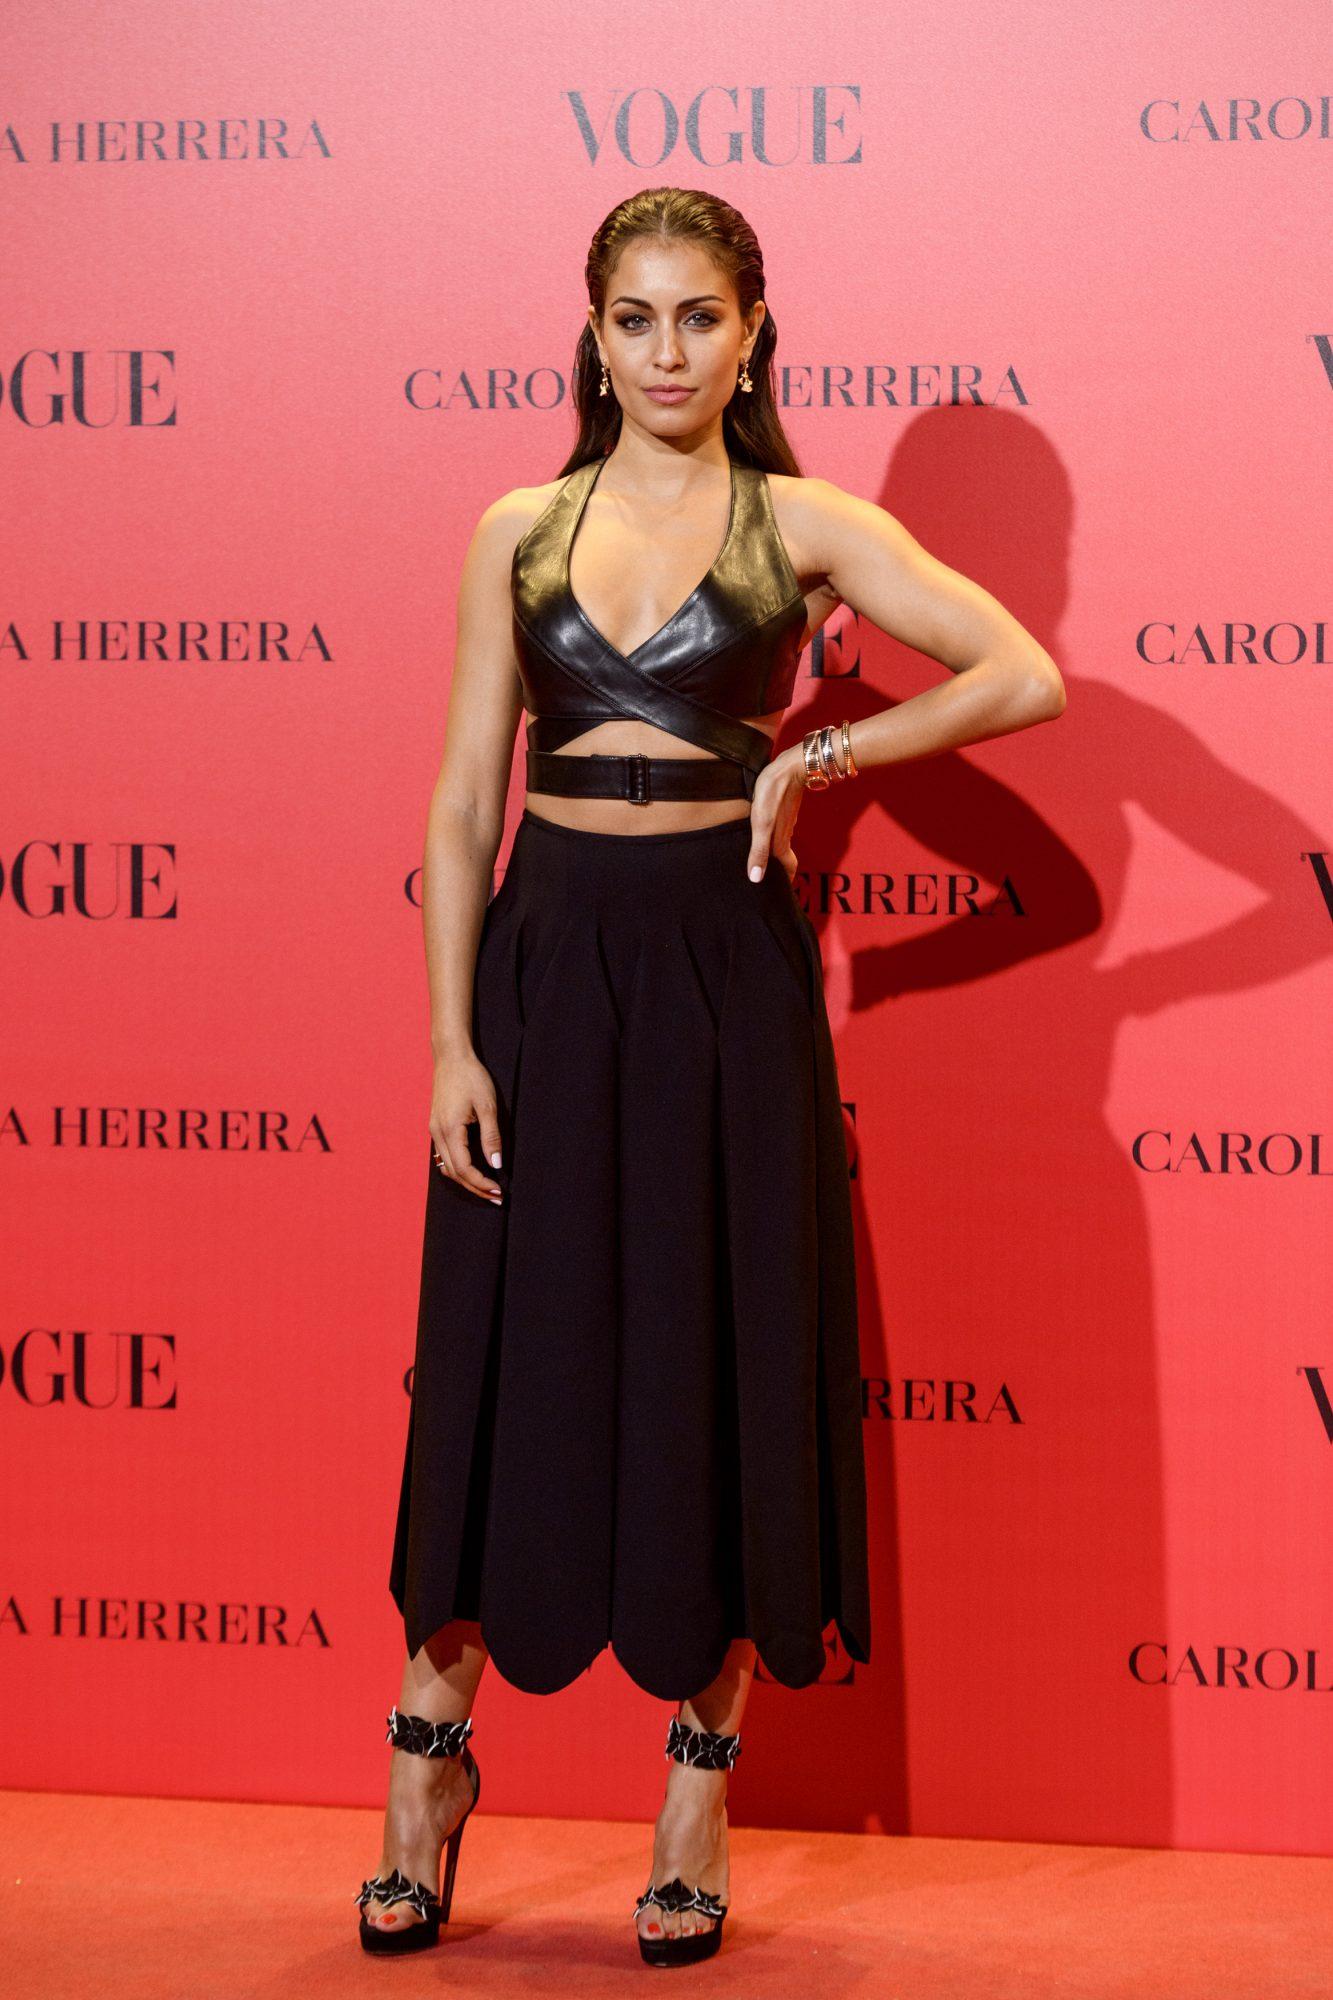 Hiba Abouk, vogue, Spain, actriz, famosa, estilo